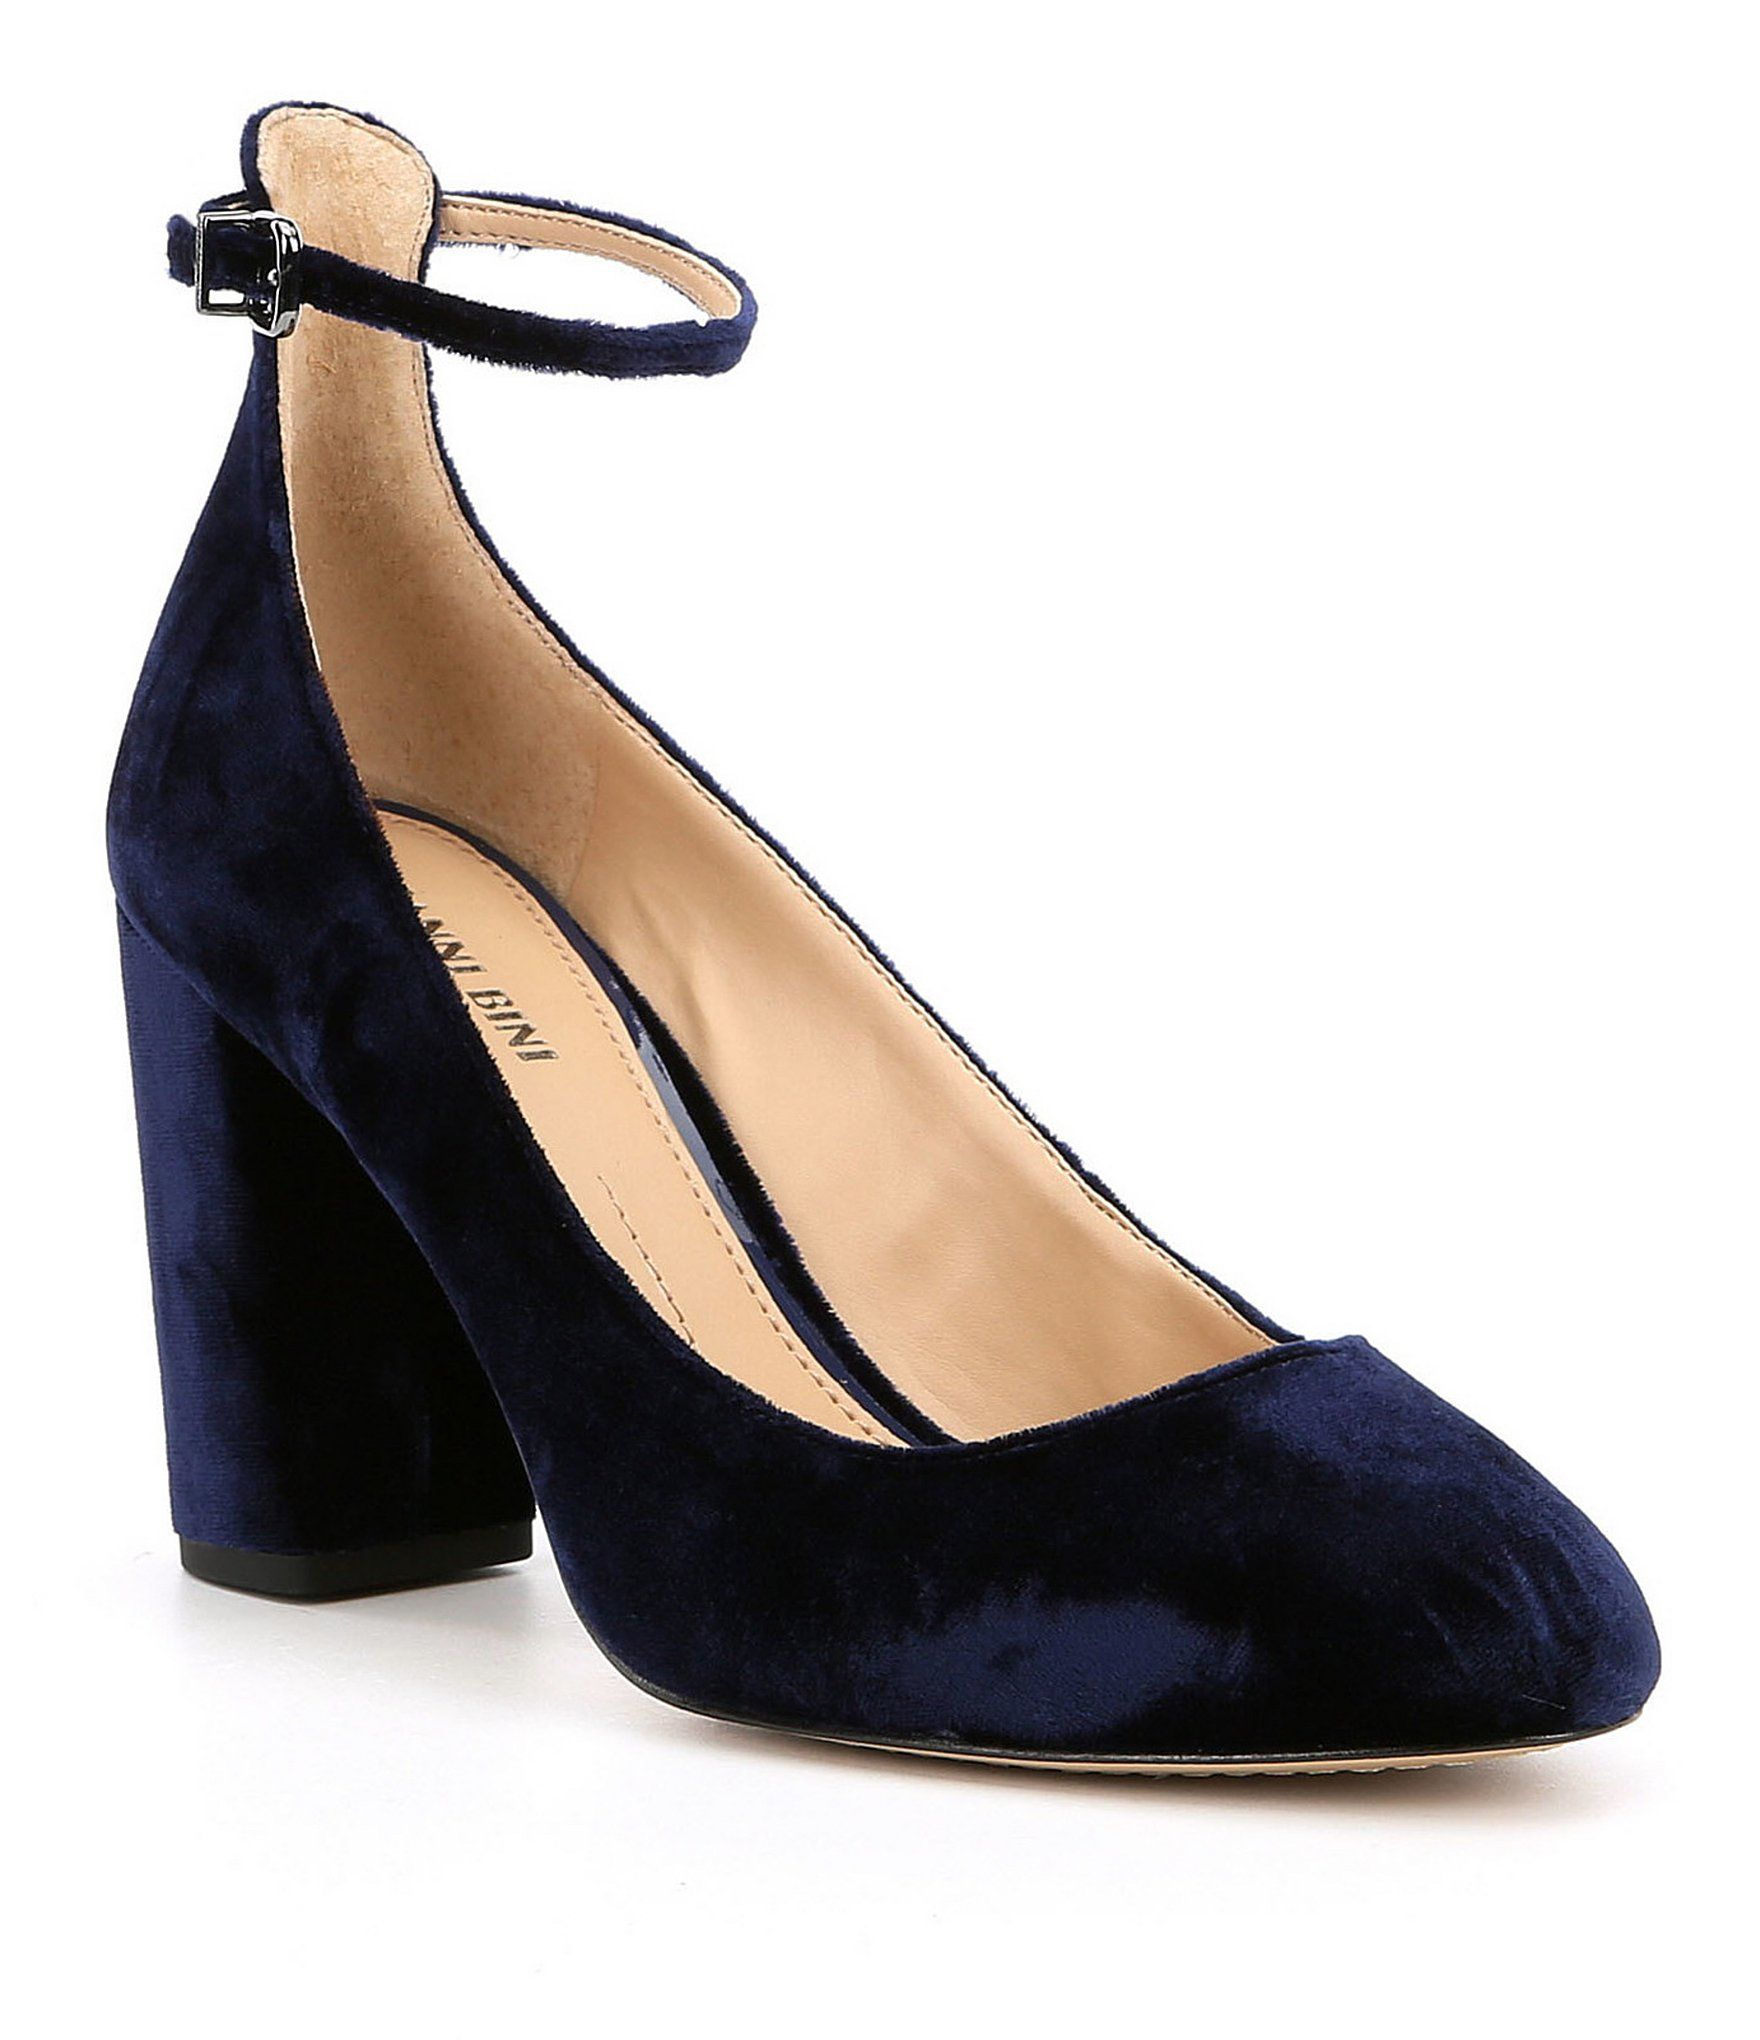 Gianni Bini Shoes   Brown Block Heel Pumps   Poshmark